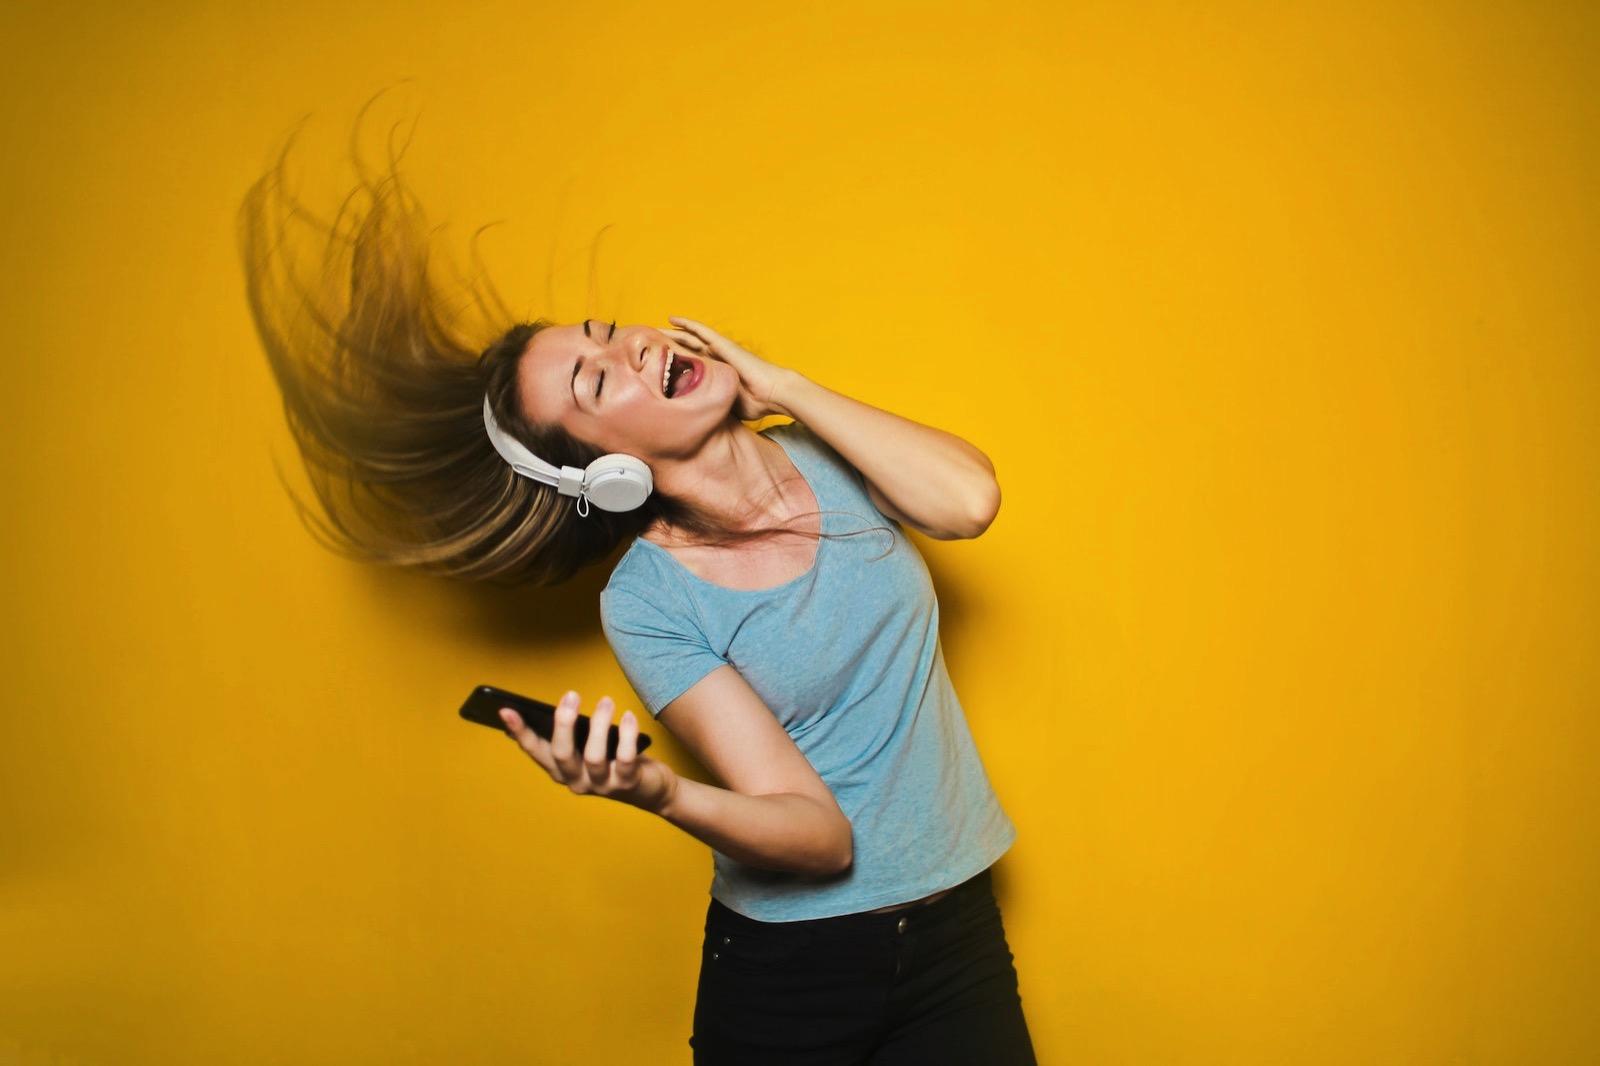 beautiful-cellphone-cute-761963-apple-music.jpg